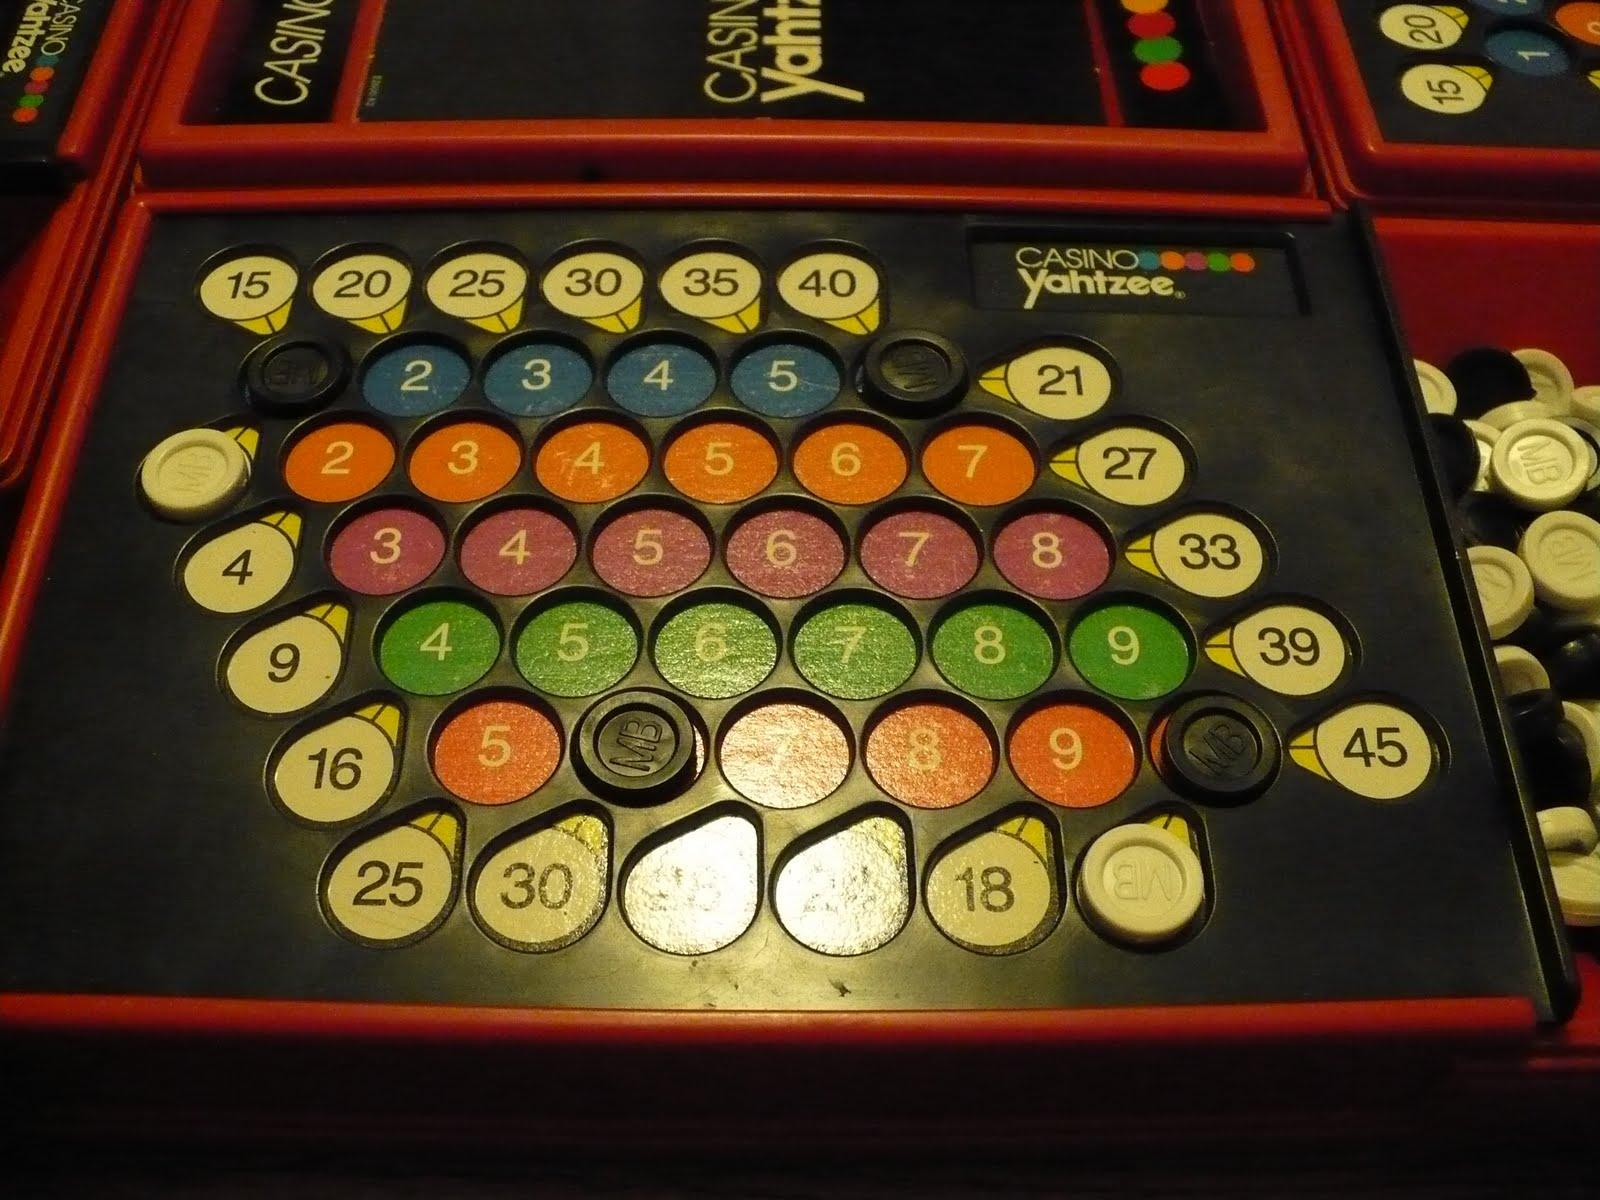 Casino yahtzee dice